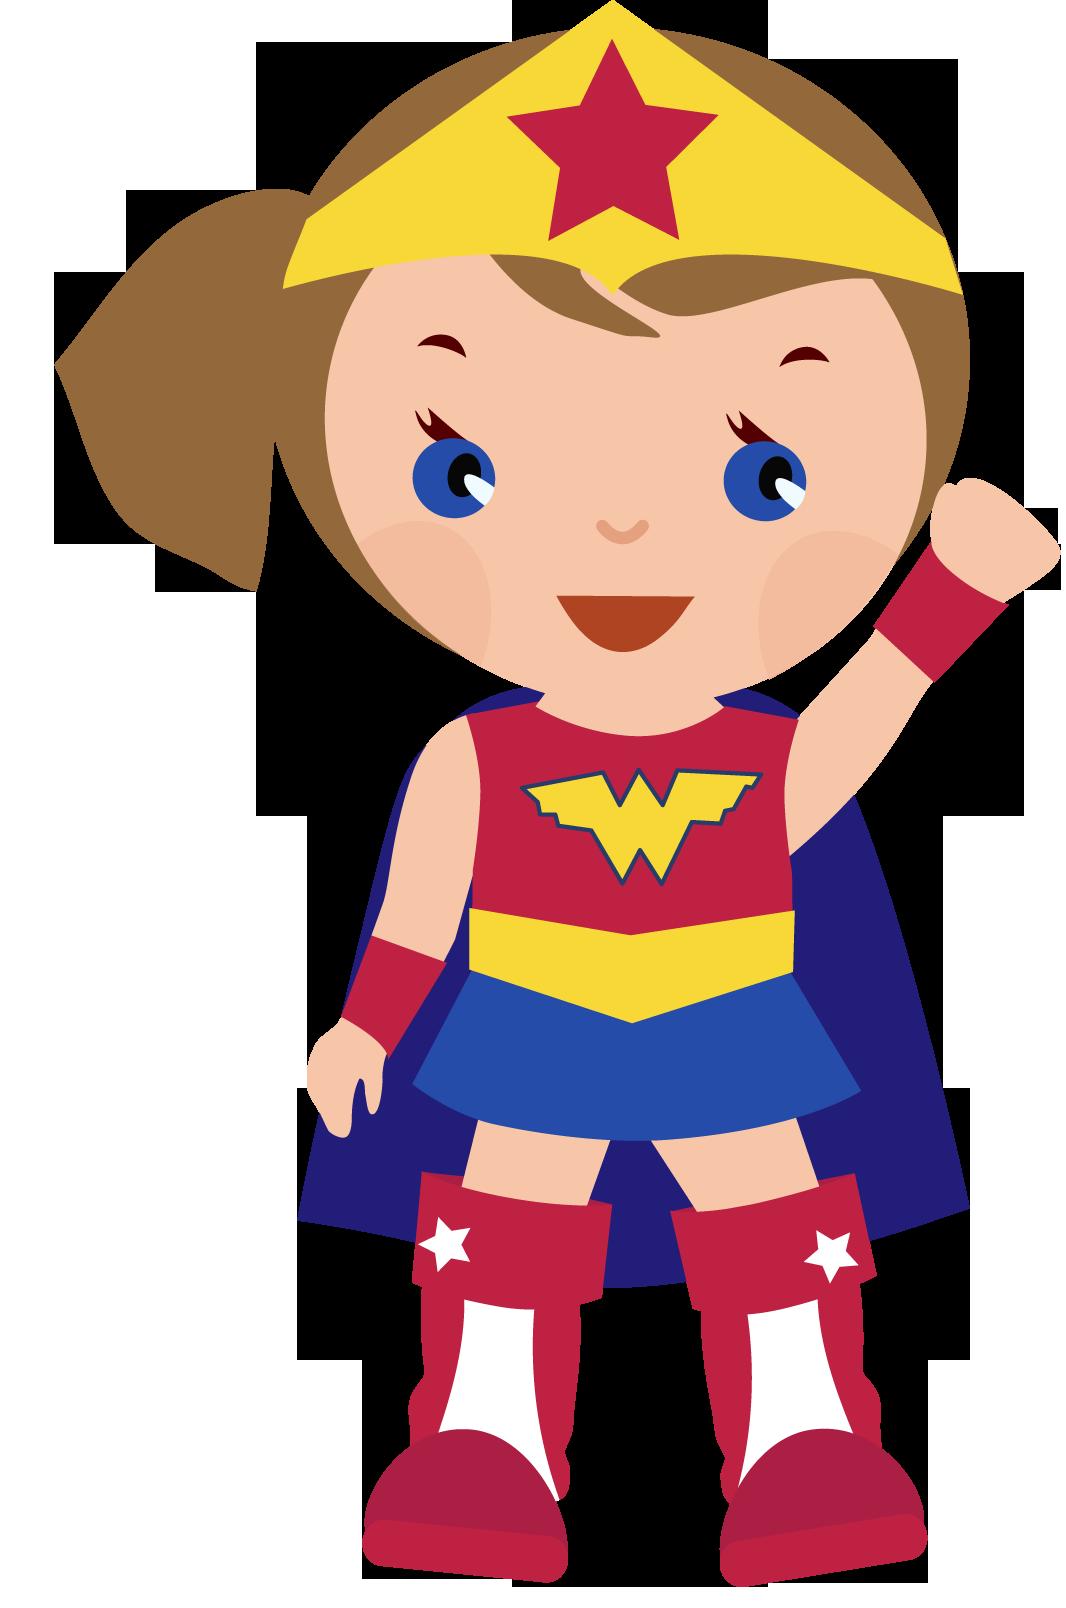 Female Superhero Clipart Clipart Best-Female Superhero Clipart Clipart Best-3